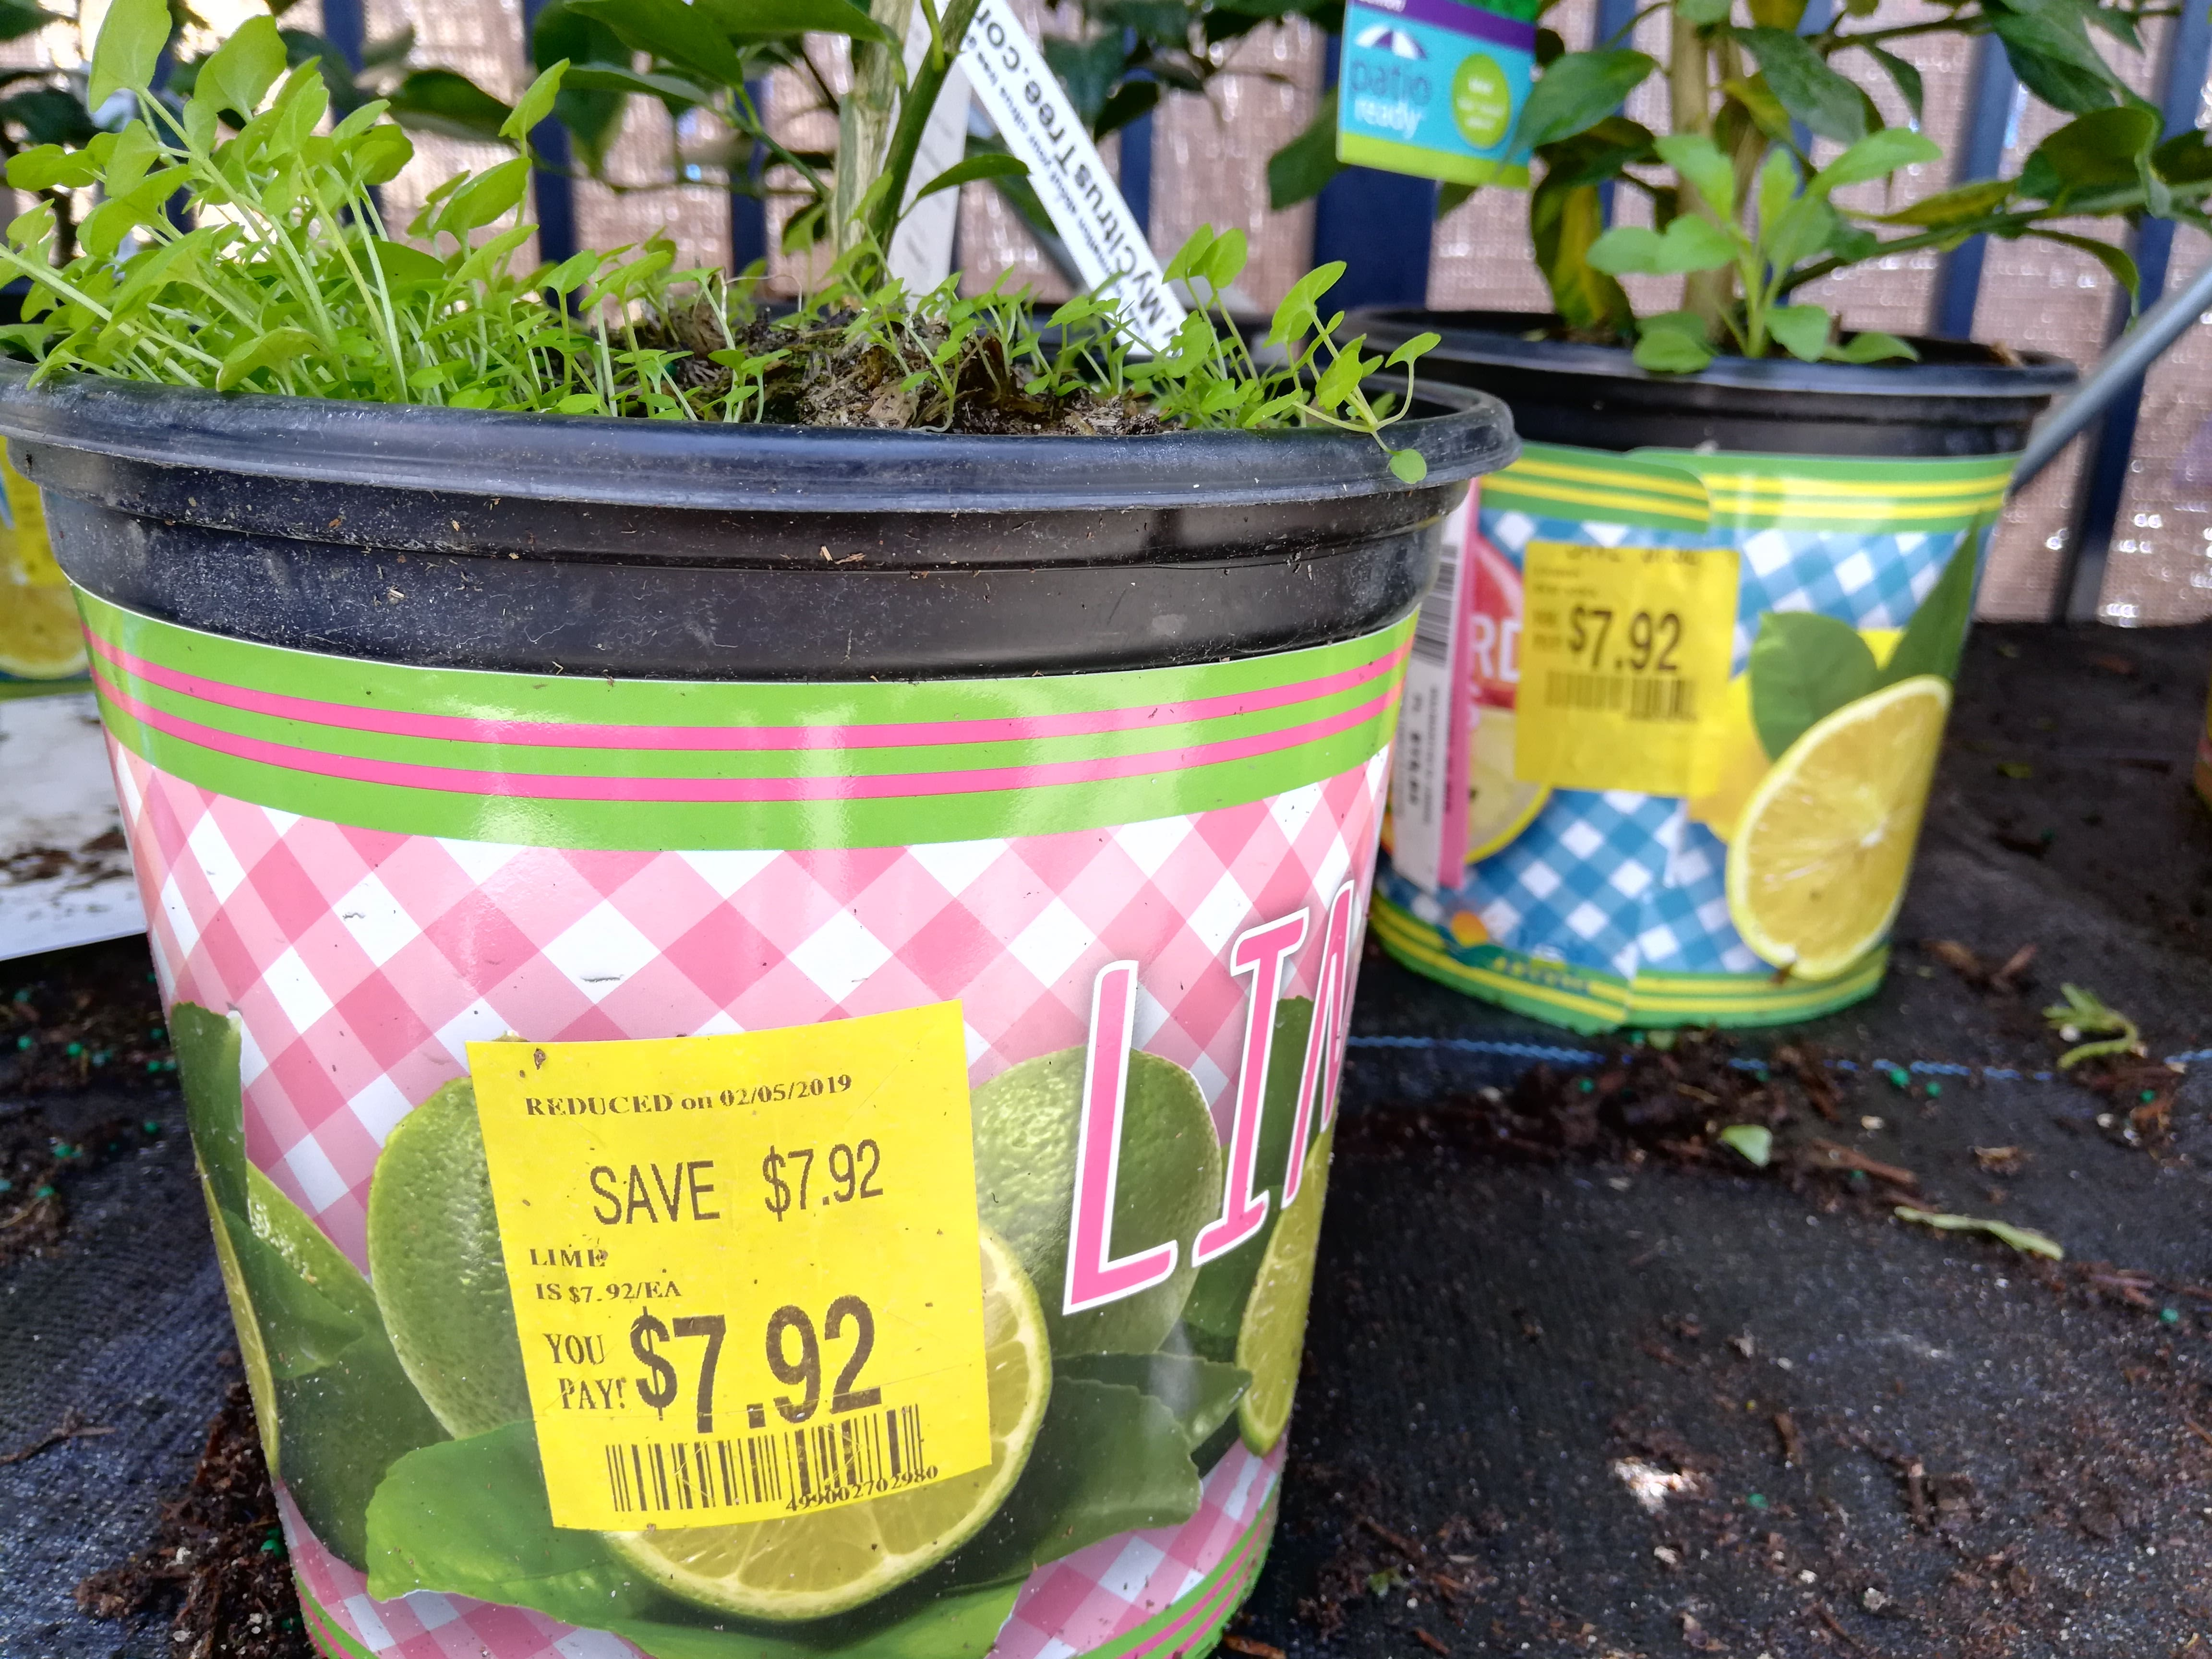 Southeast YMMV- Walmart lemon/lime patio citrus clearance $8